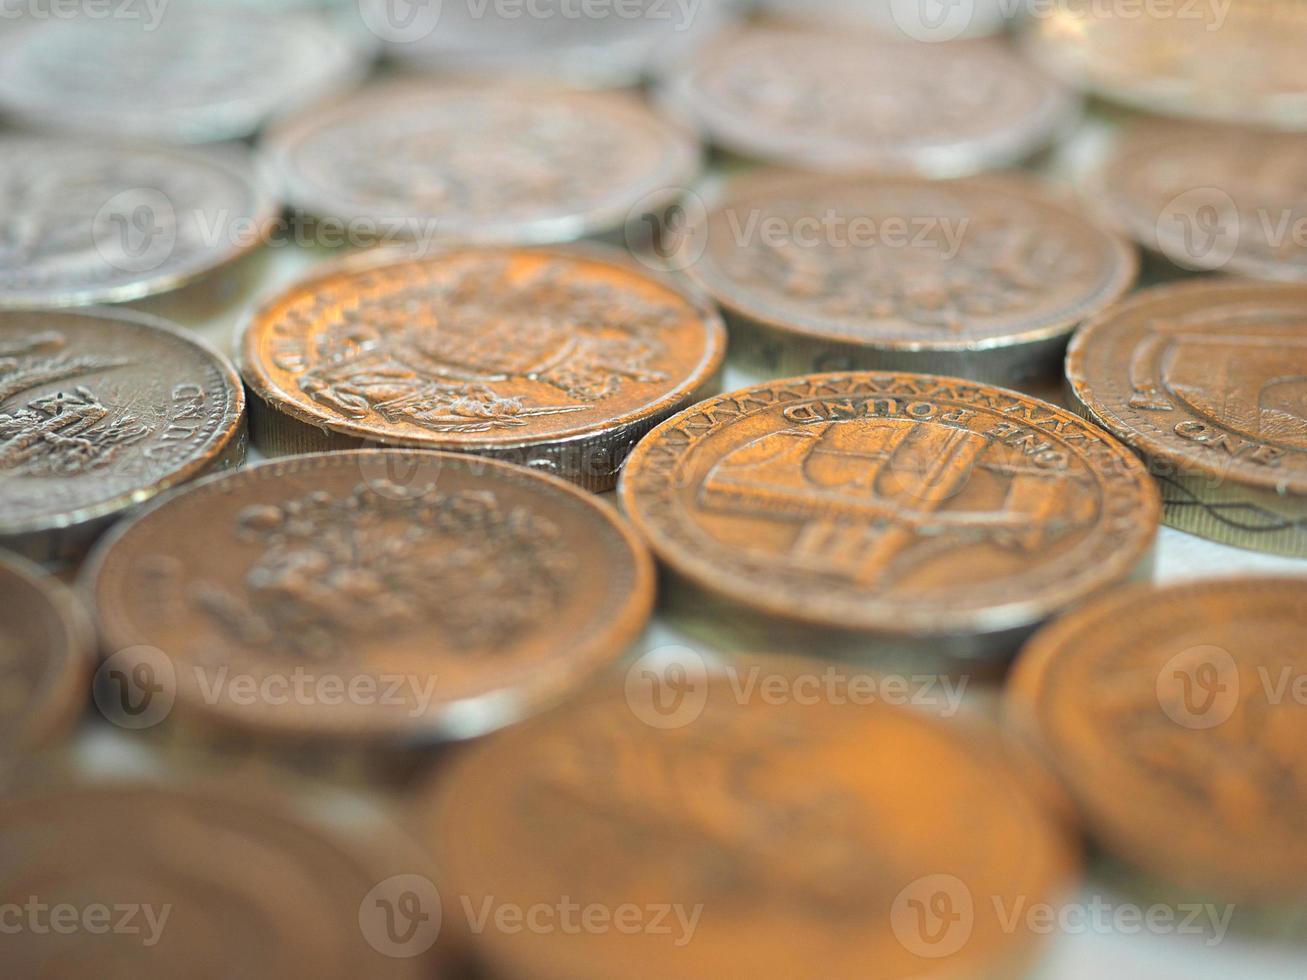 Pound GBP coin, United Kingdom UK photo